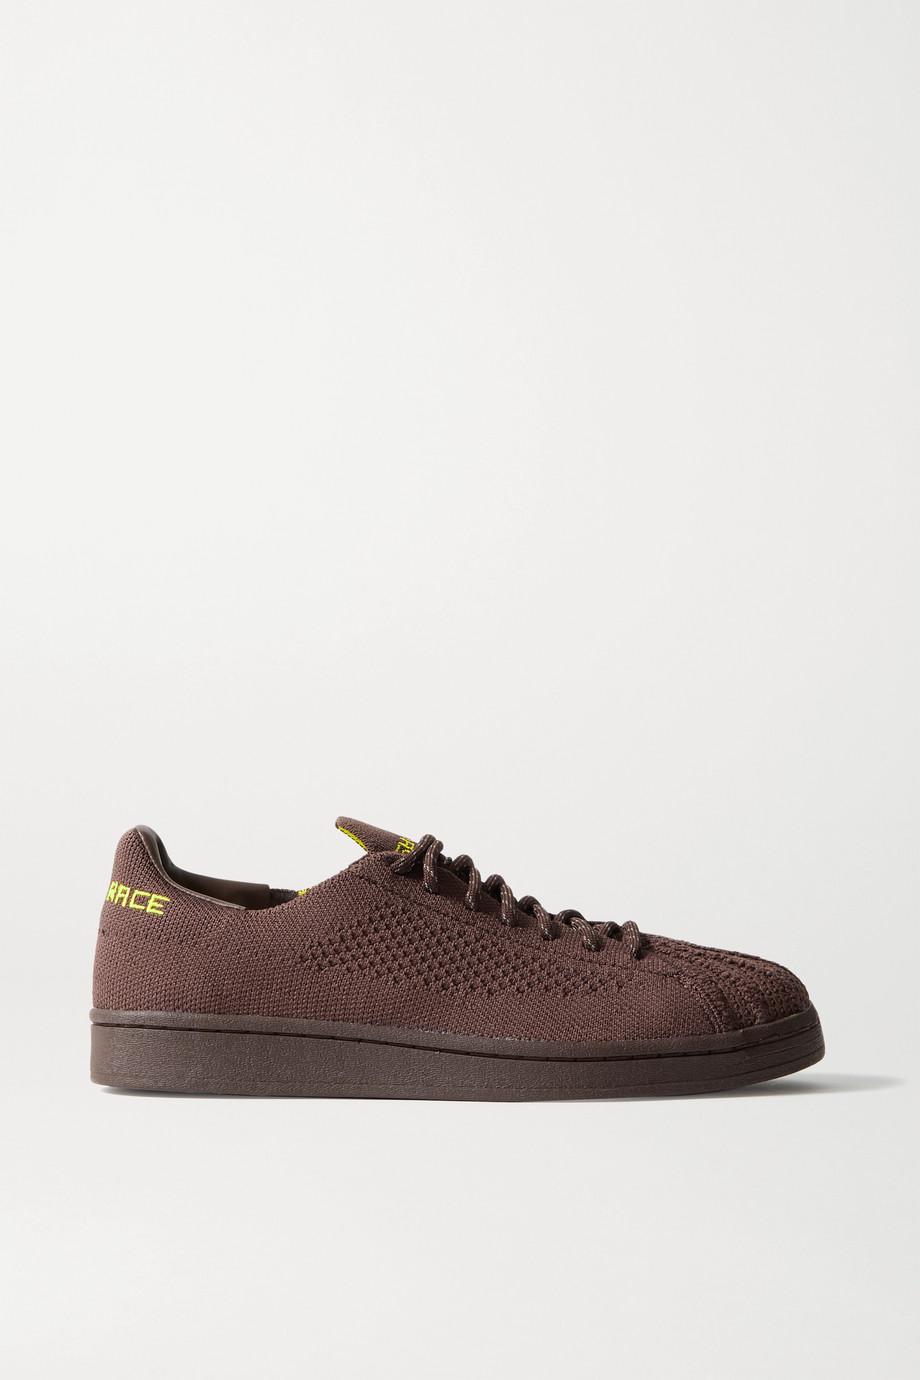 adidas Originals + Pharrell Williams Superstar Primeknit sneakers